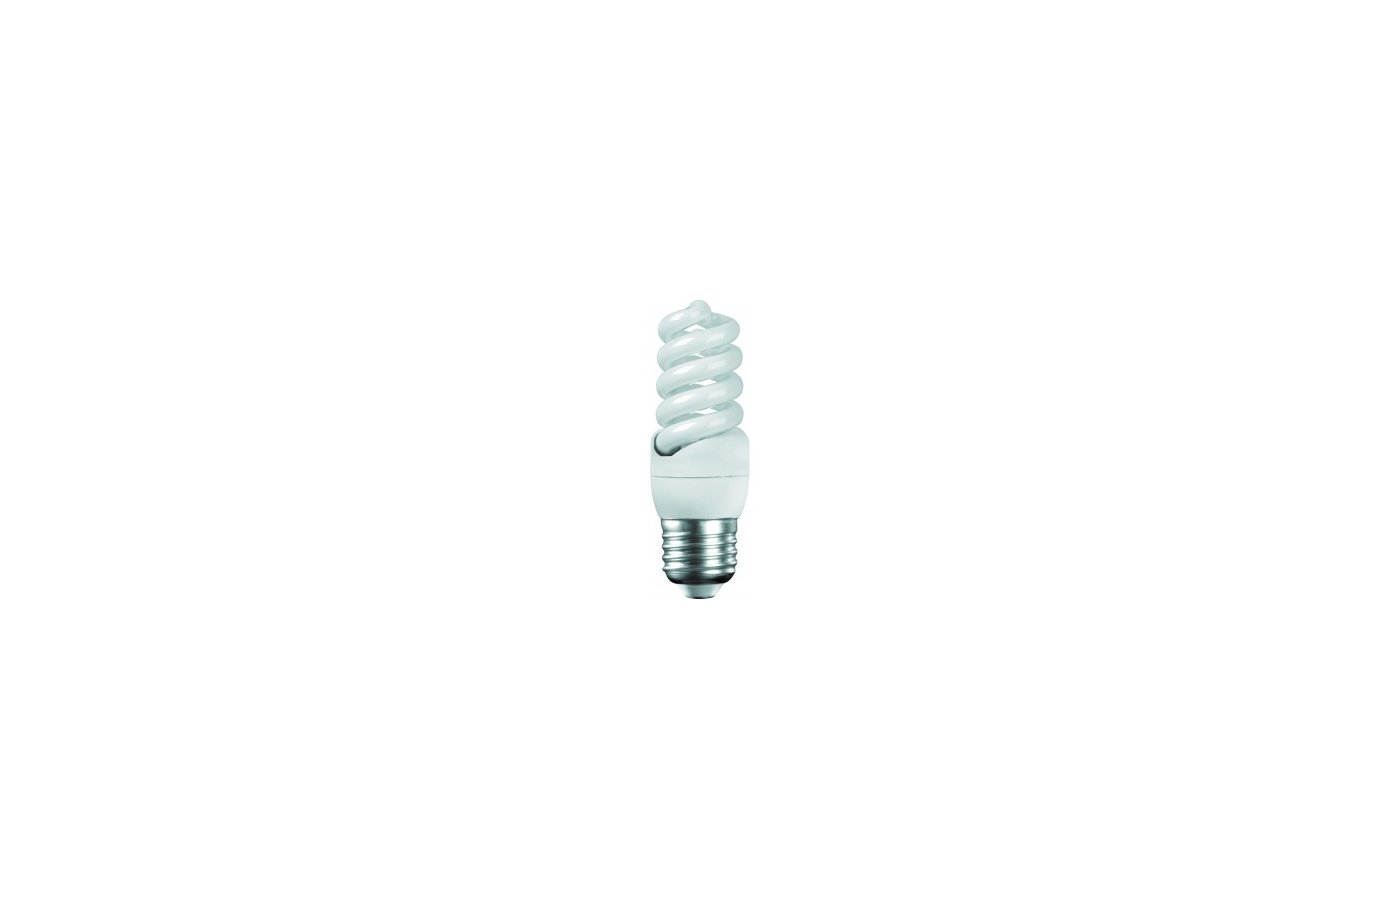 Лампочки энергосберегающие Camelion LH13-FS-T2-M/827/E27 (энергосбер.лампа 13Вт 220В)